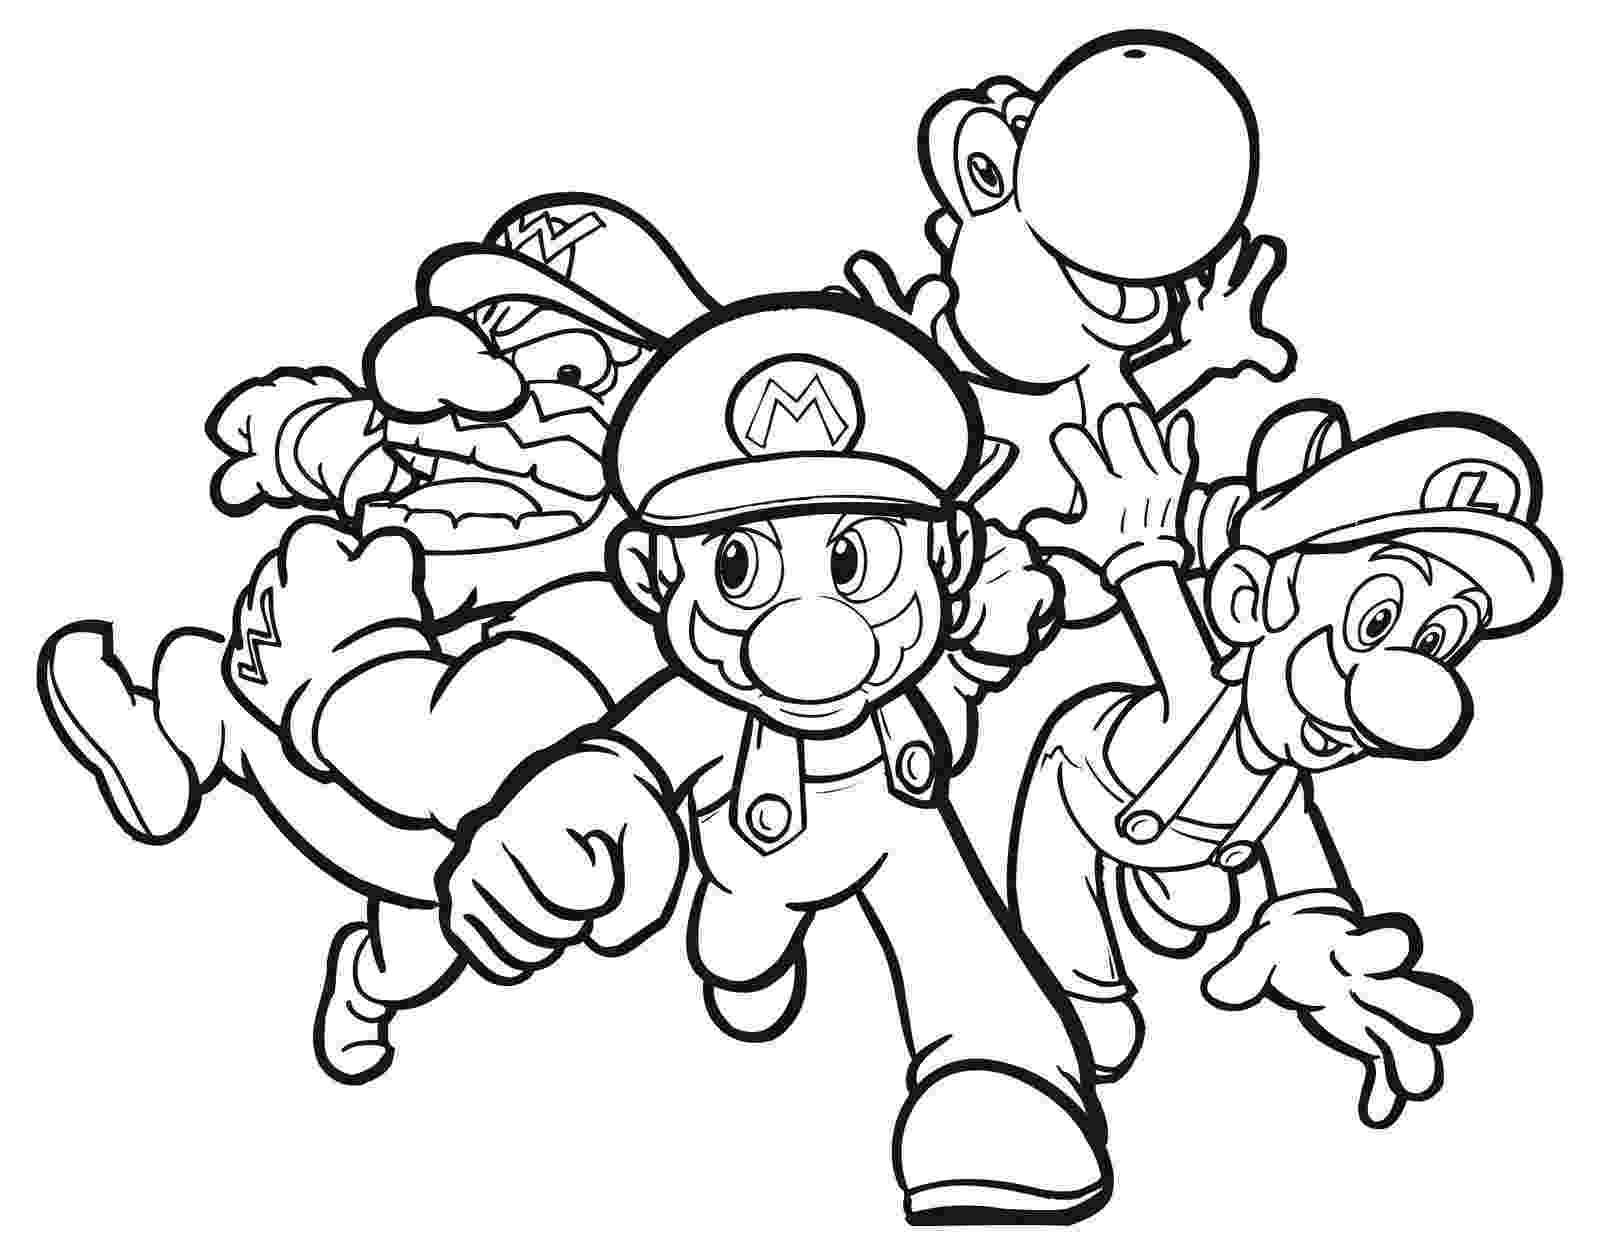 super mario coloring games super mario coloring pages free printable coloring pages coloring mario super games